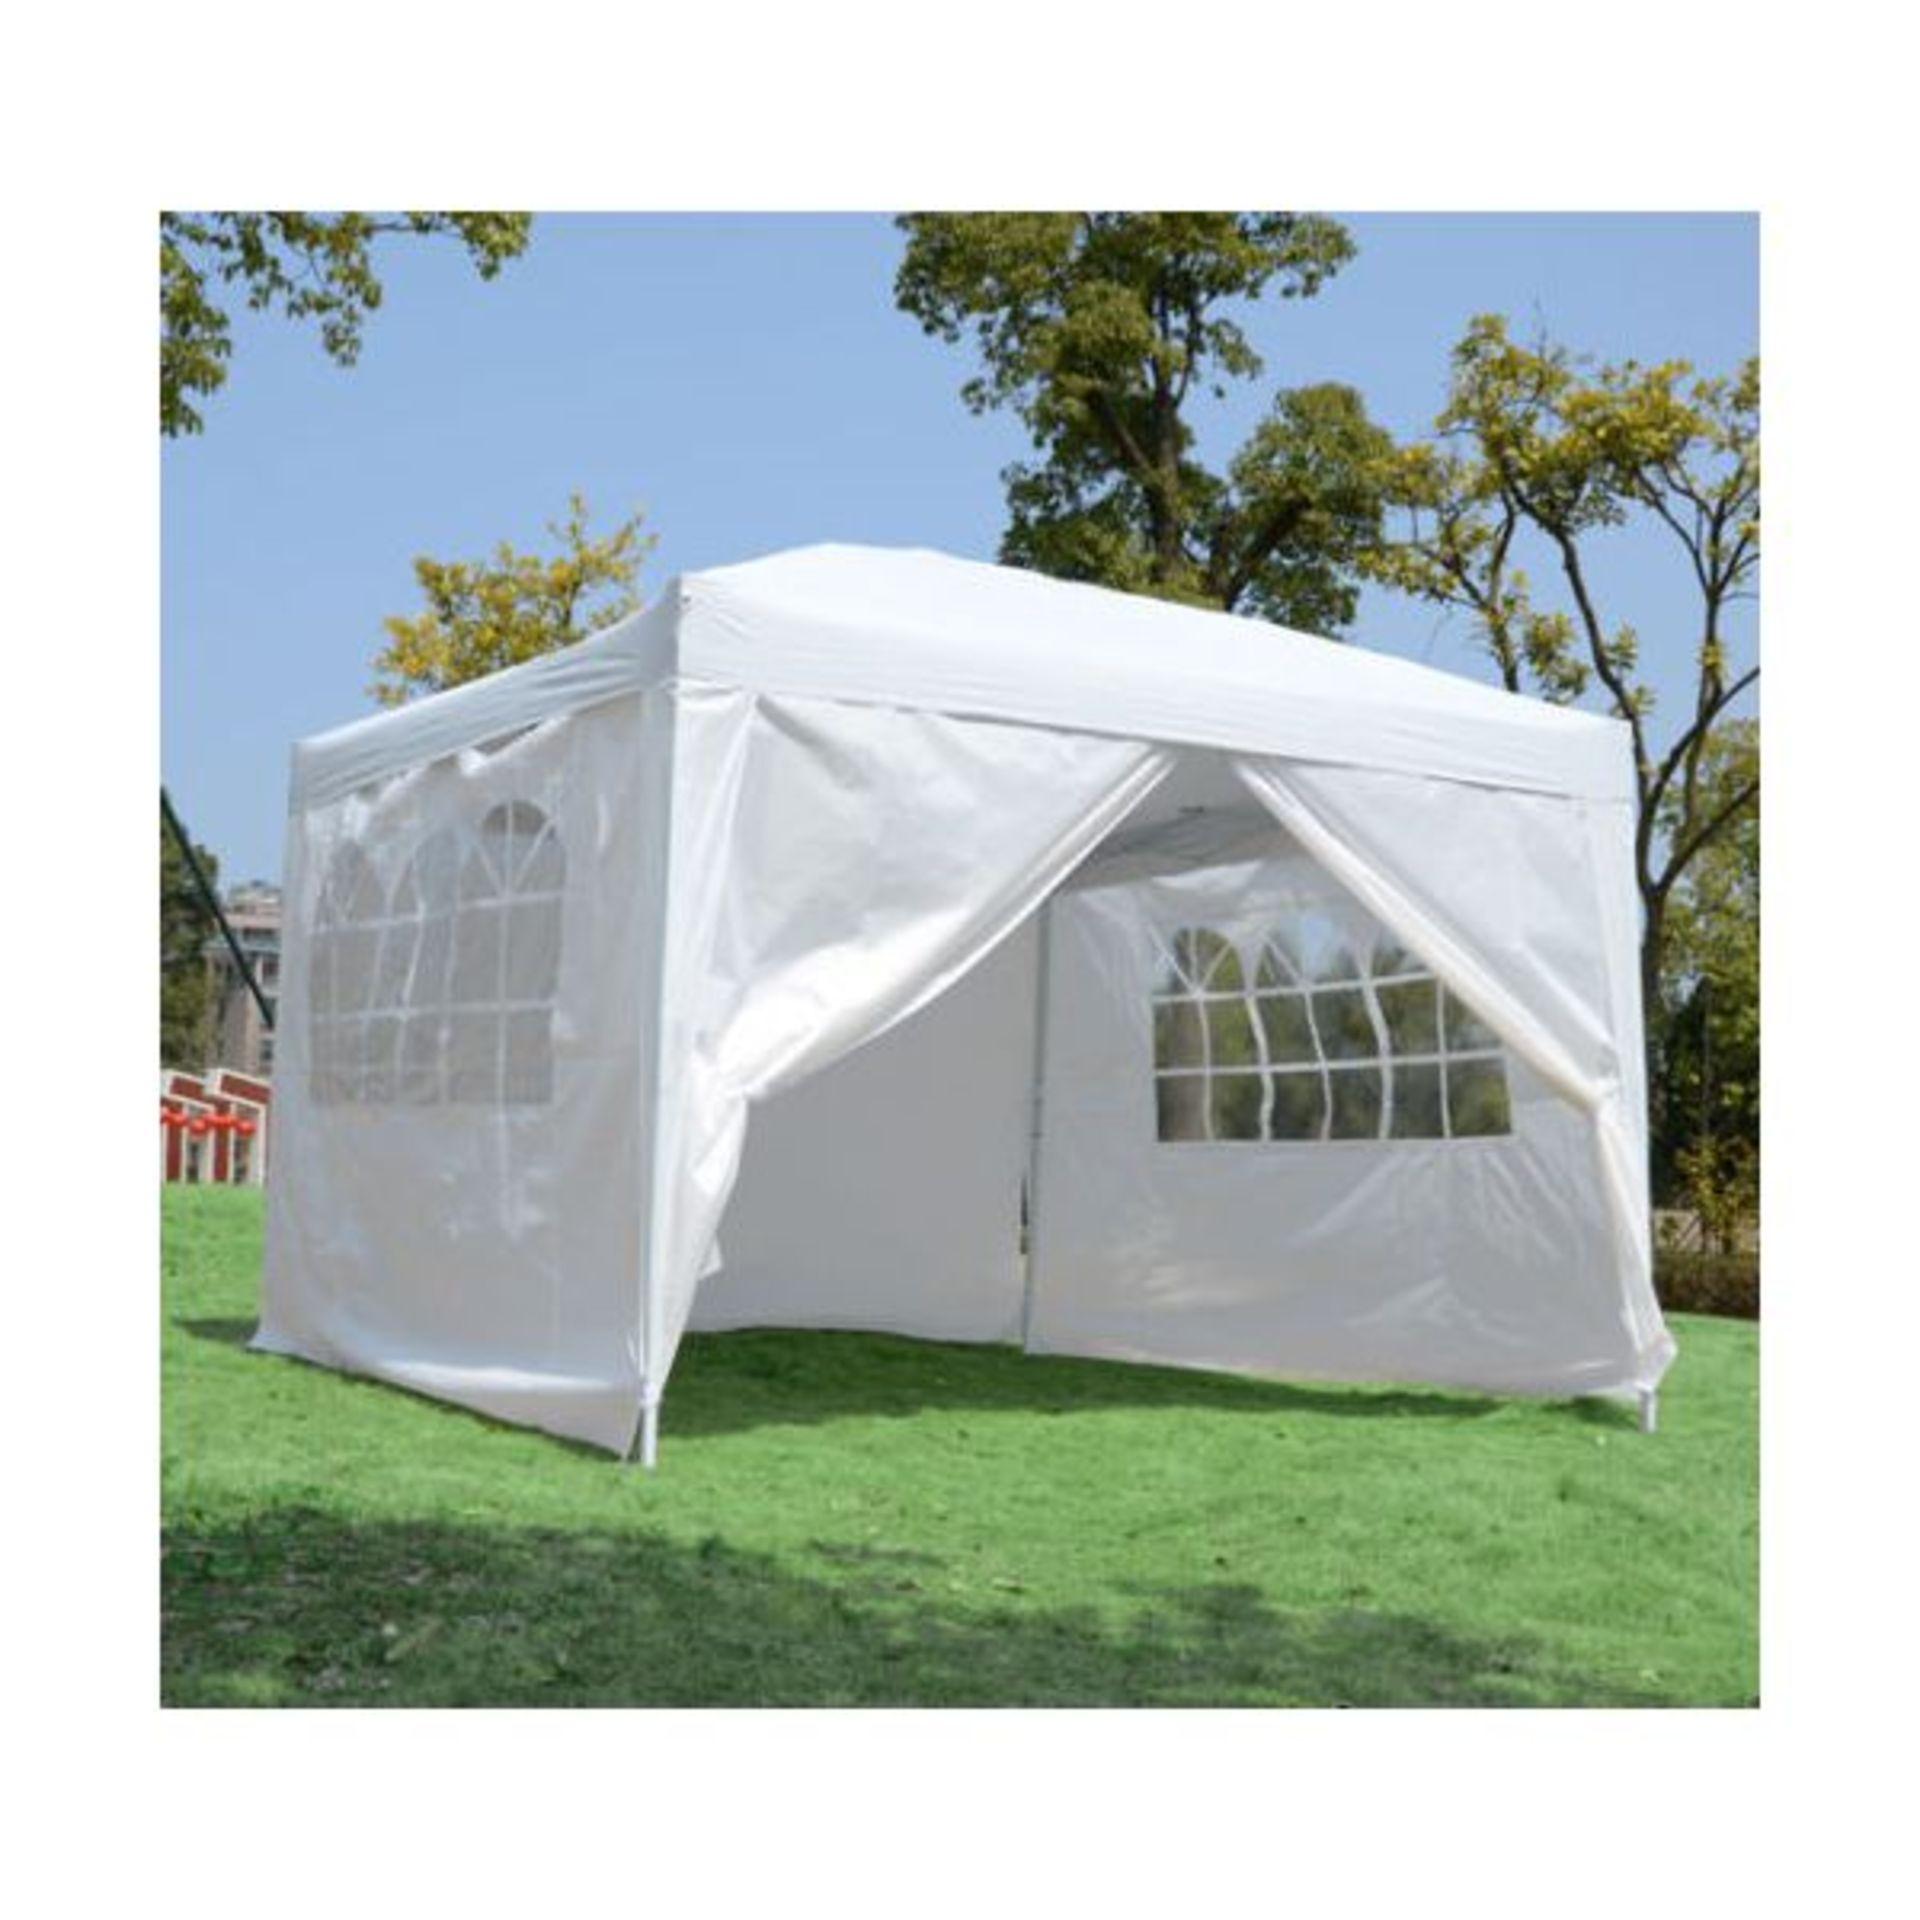 Lot 32047 - V Brand New DG Pop Up Gazebo With Side Panels 3m x 3m ISP £119.99 (Gala Tent)